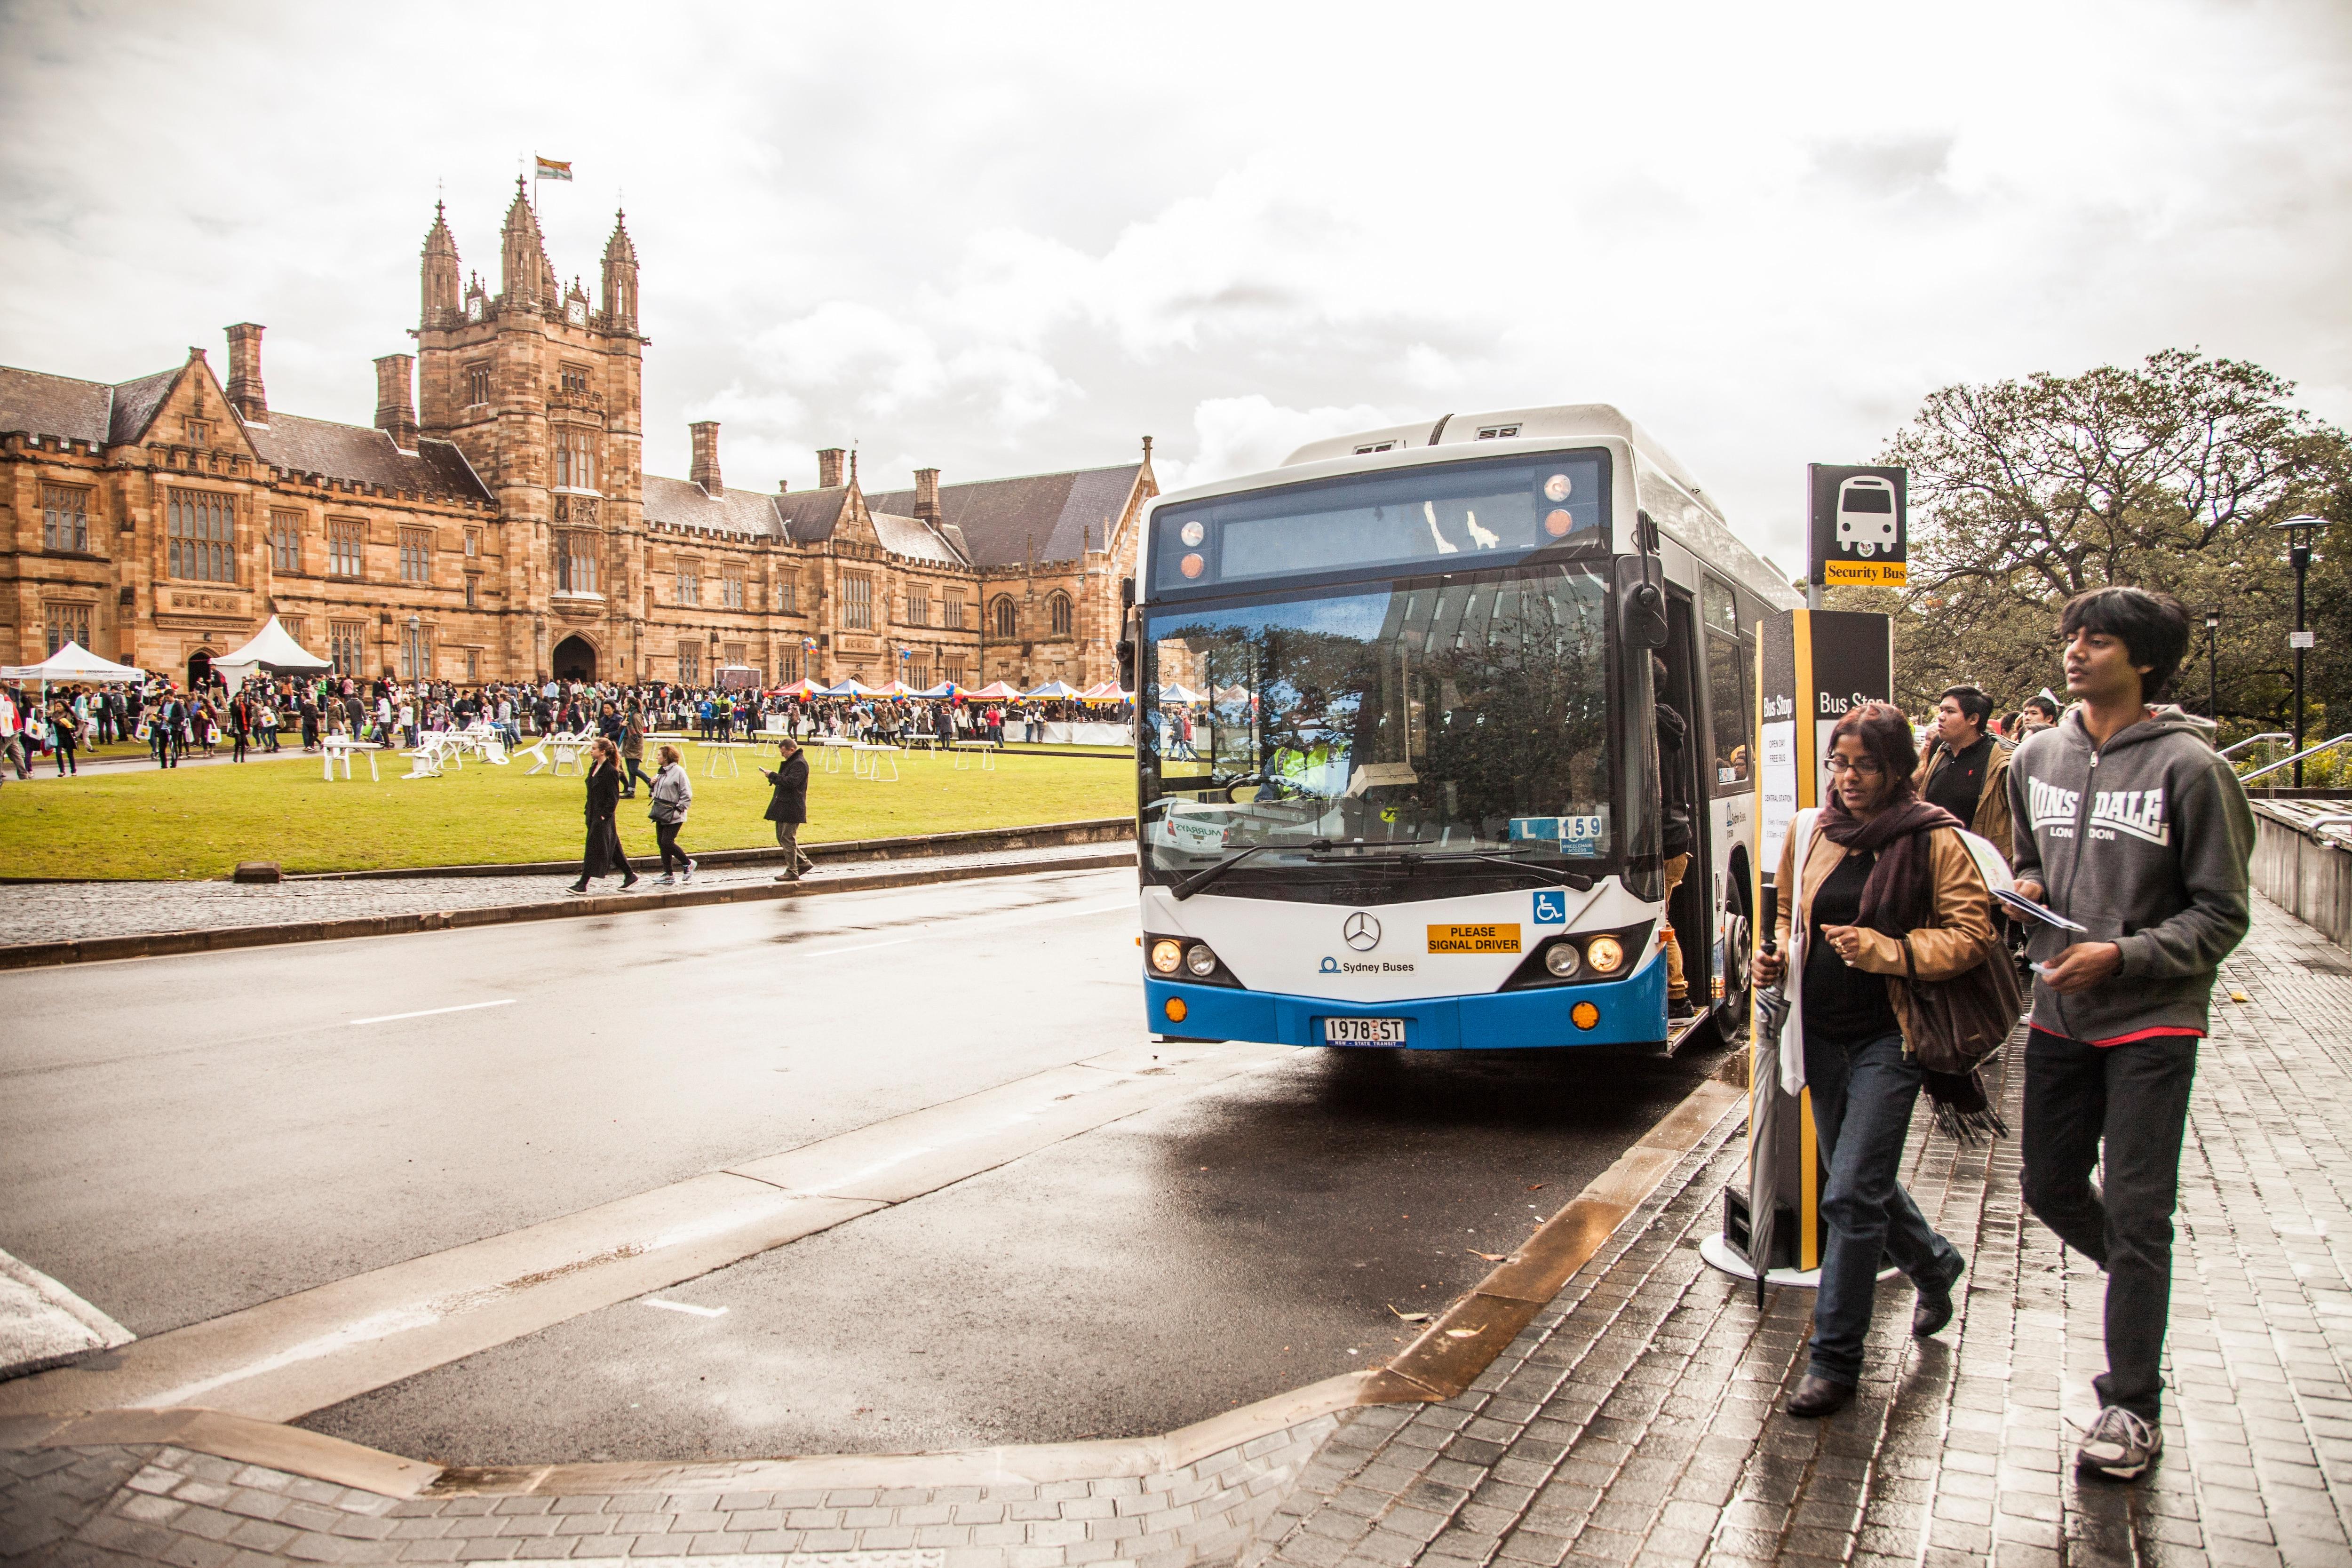 Public transport - The University of Sydney